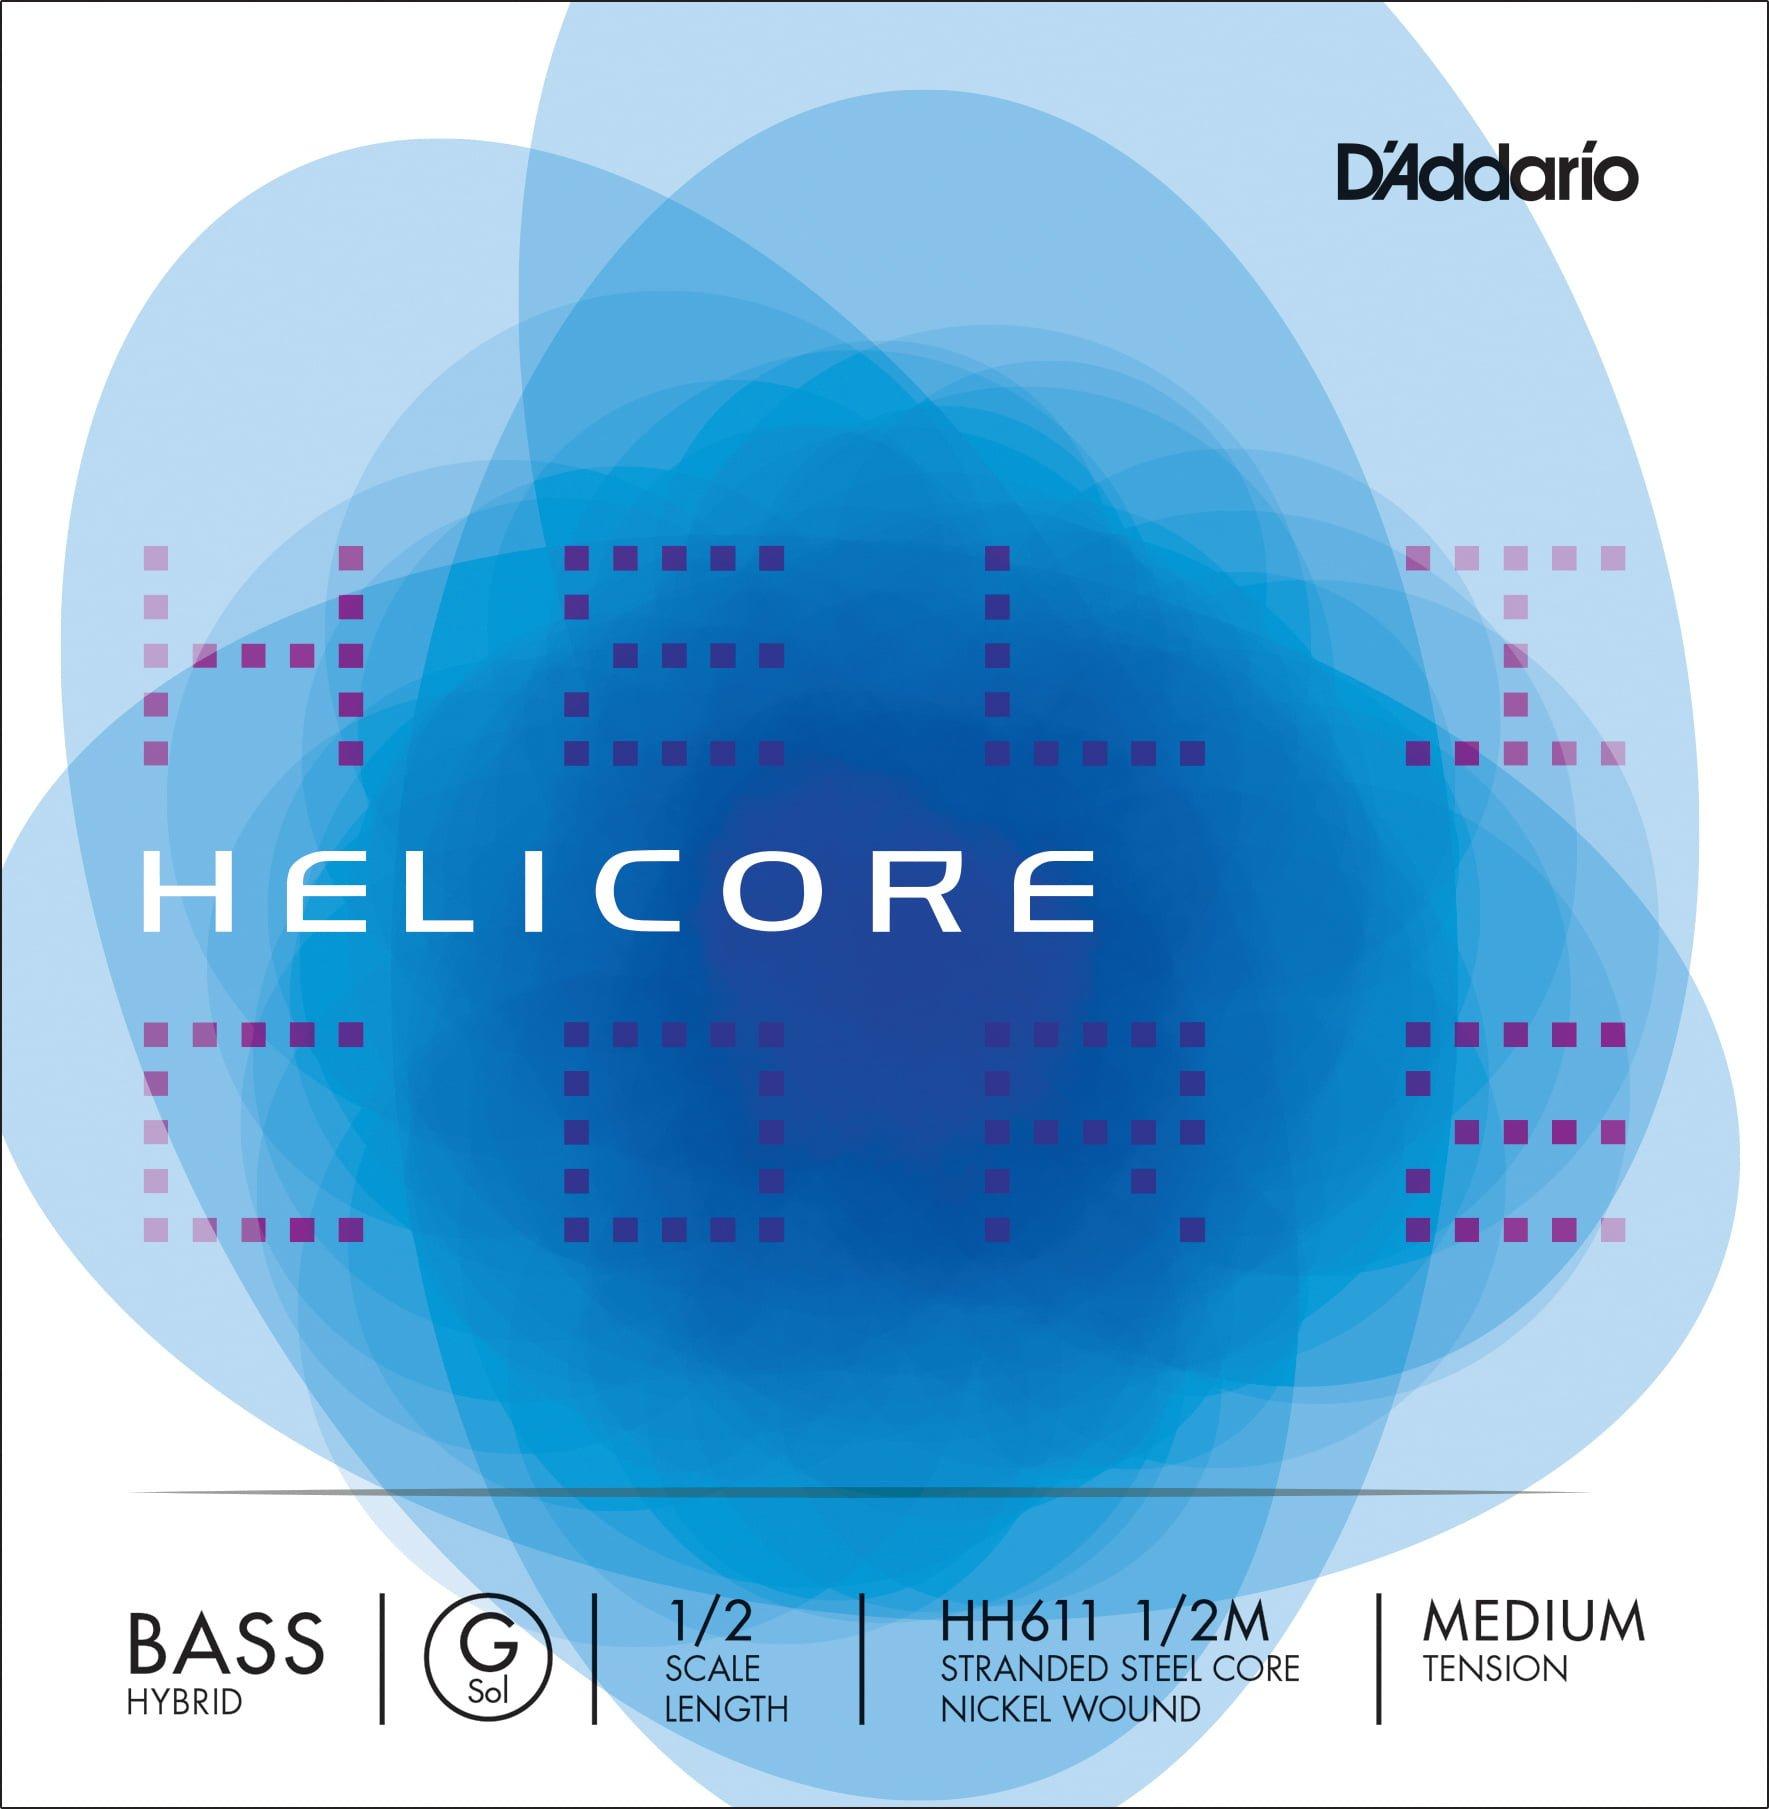 Helicore Hybrid Double Bass G String 1/2 Medium